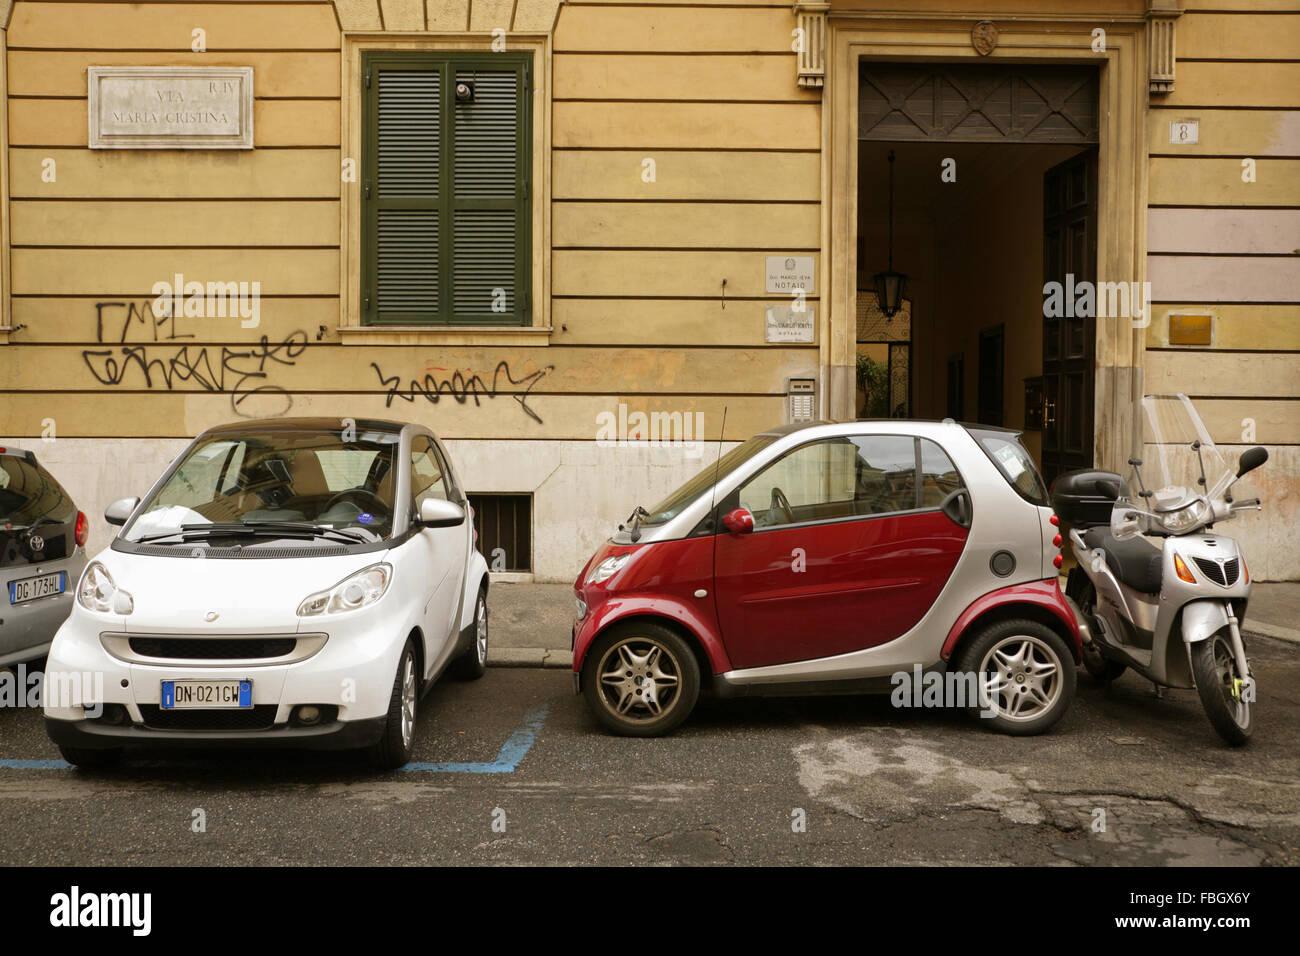 Parking Smart Cars Stock Photos & Parking Smart Cars Stock Images ...